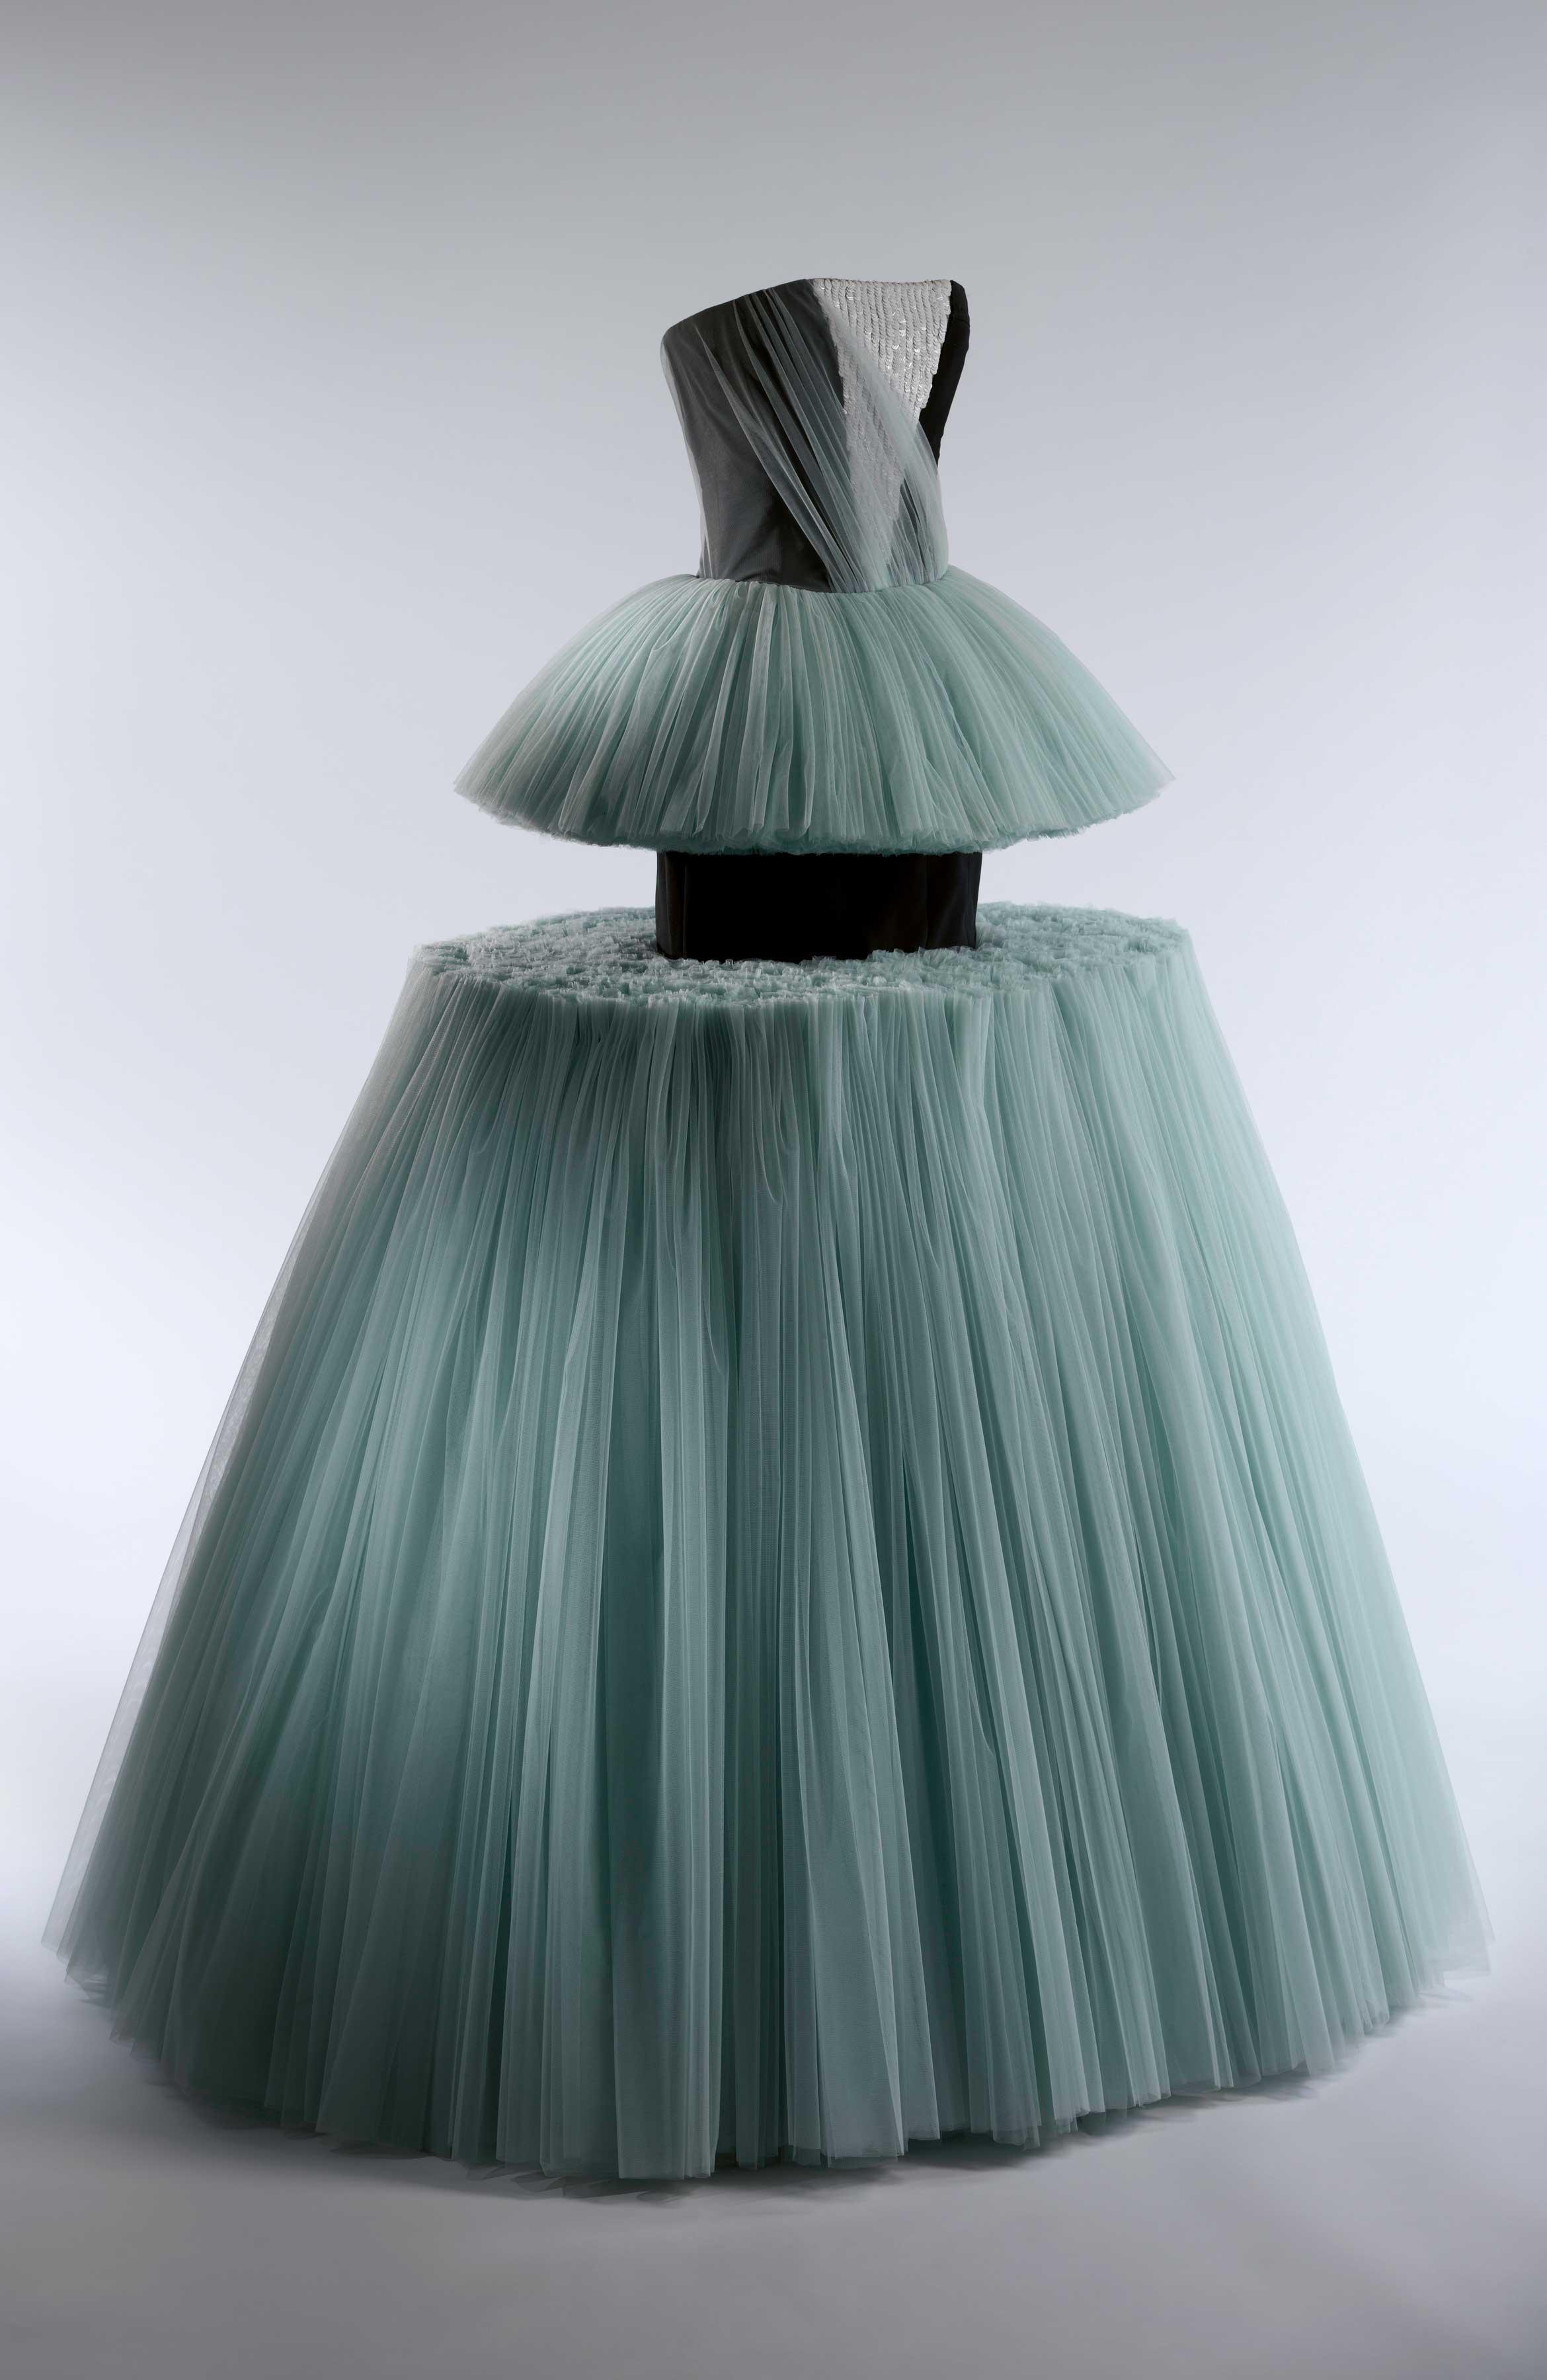 Masterworks: Unpacking Fashion fashion feat. Viktor & Rolf